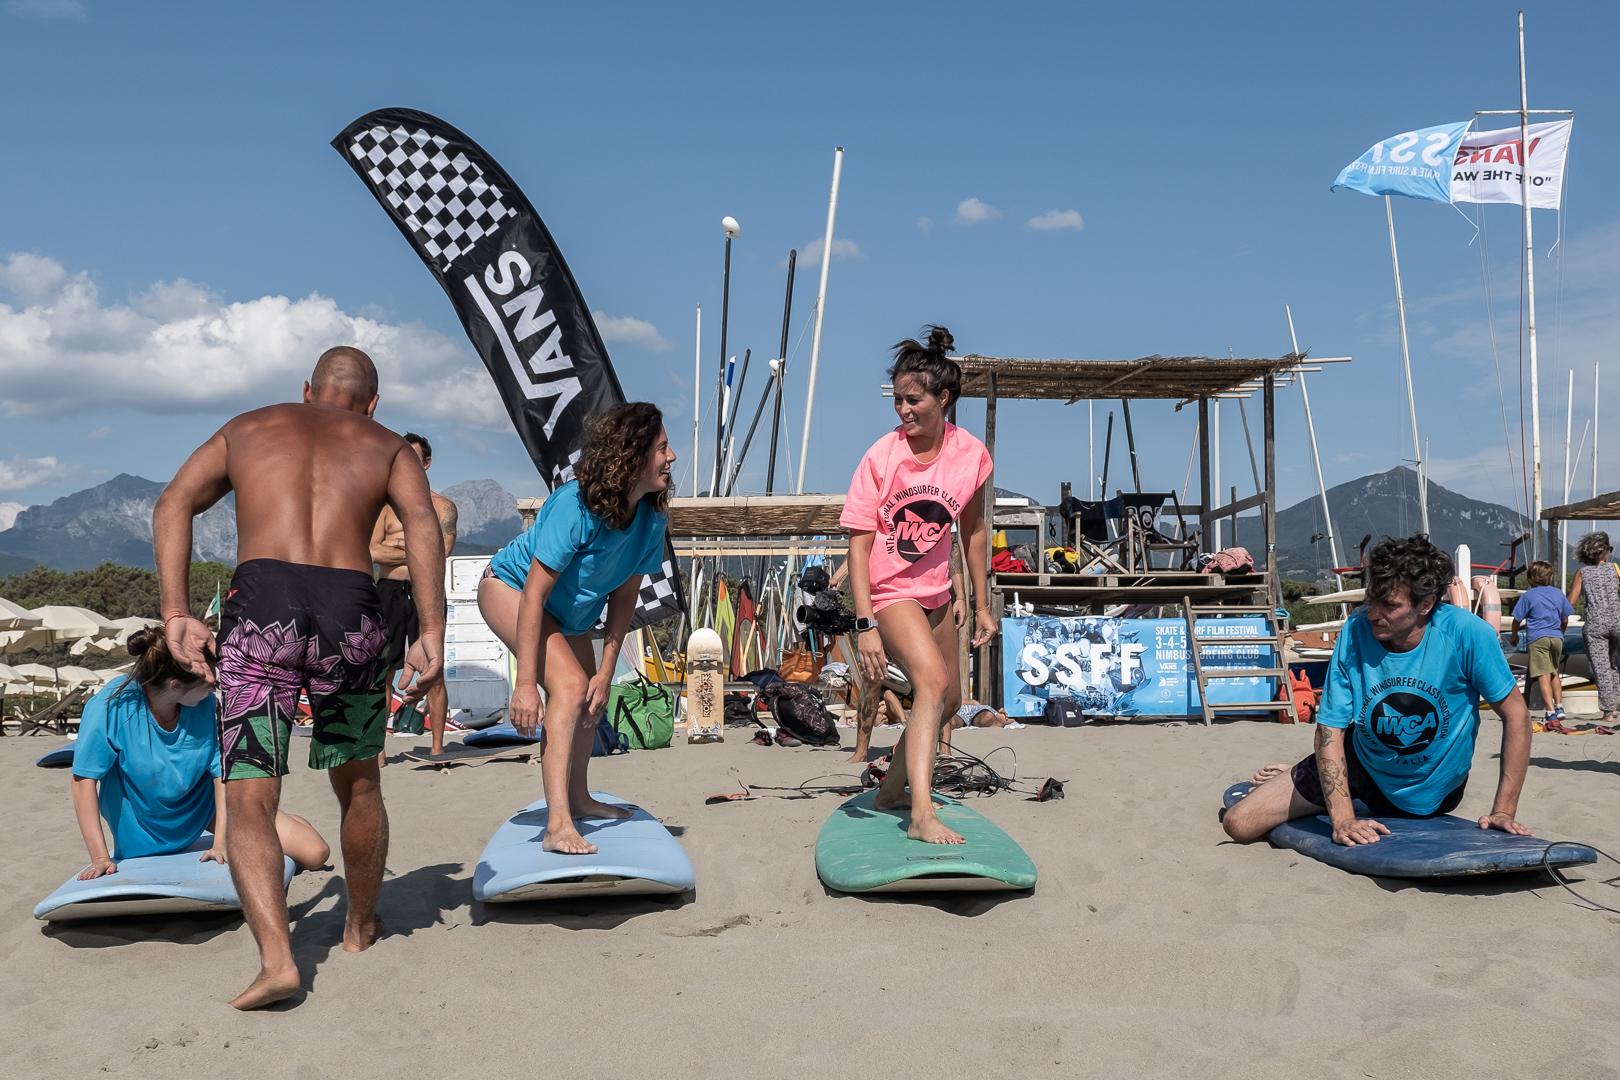 REPORT SSFF – SKATE AND SURF FILM FESTIVAL 2021